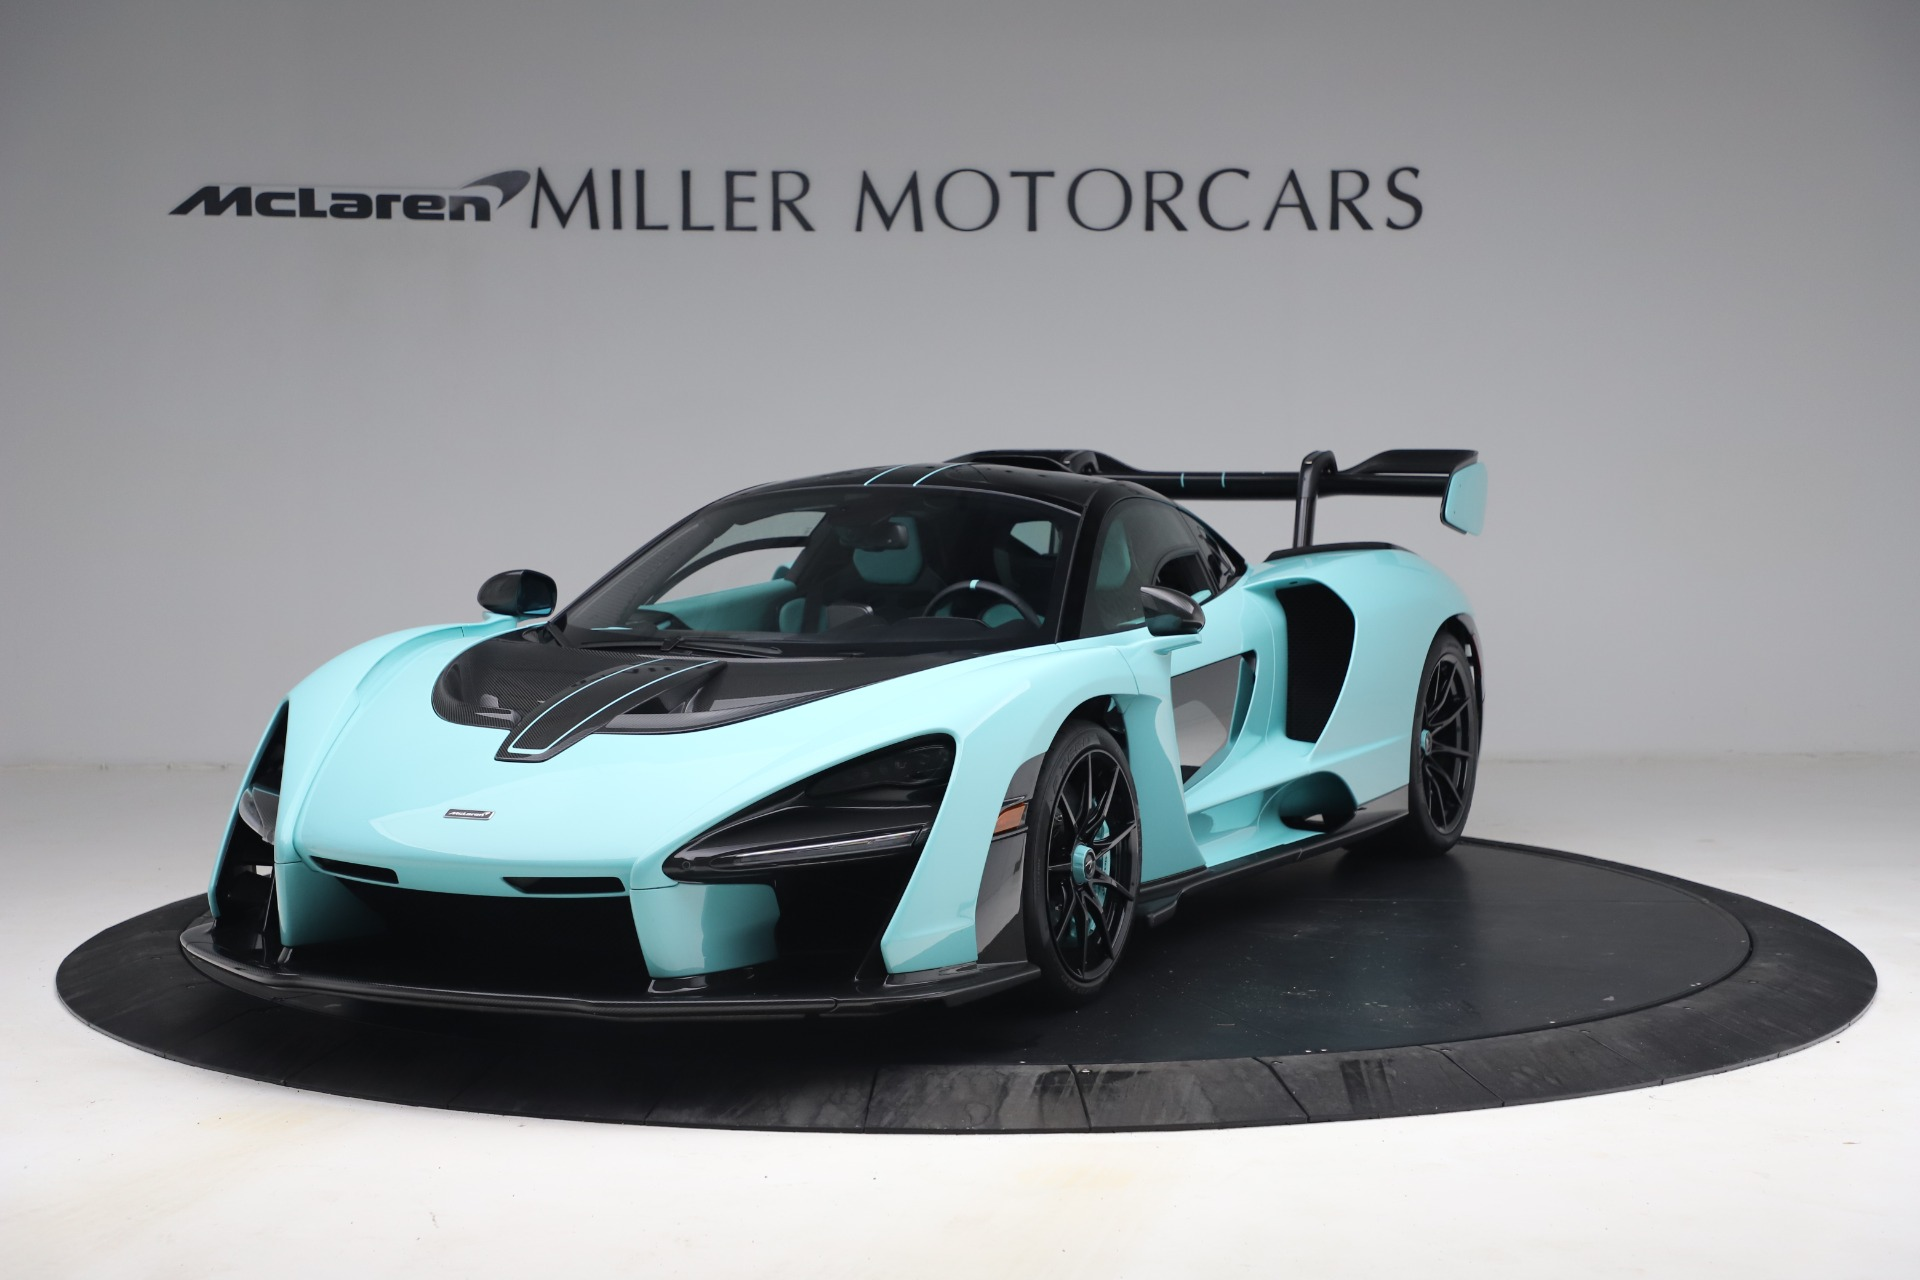 Used 2019 McLaren Senna for sale Sold at Bugatti of Greenwich in Greenwich CT 06830 1